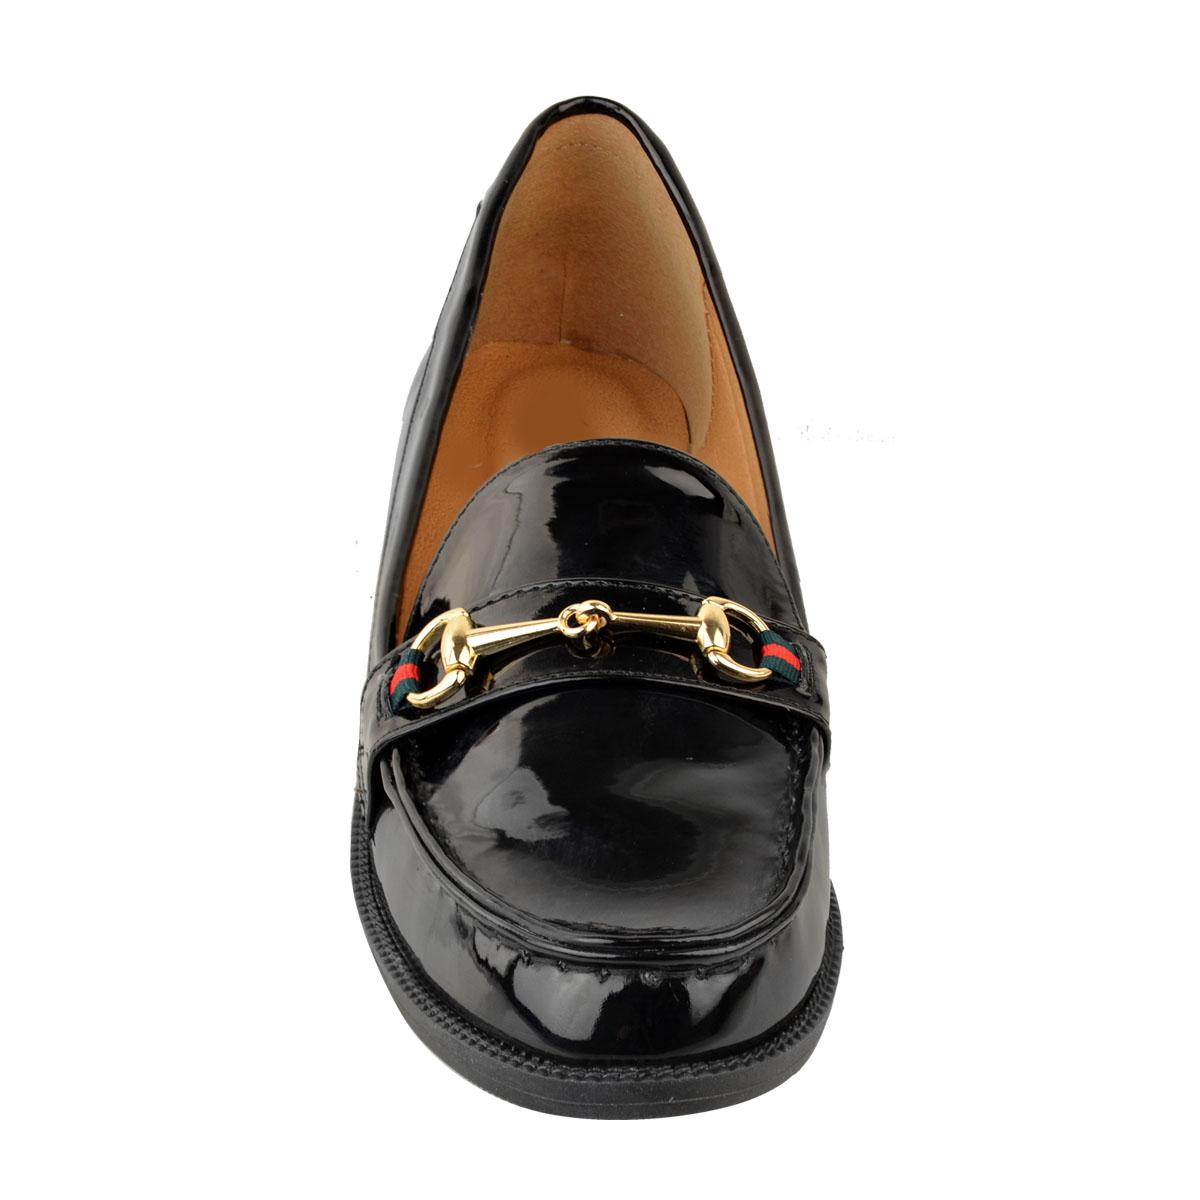 Womens Ladies New Flat Horsebit Loafers School Shoes Designer Smart Office Pumps